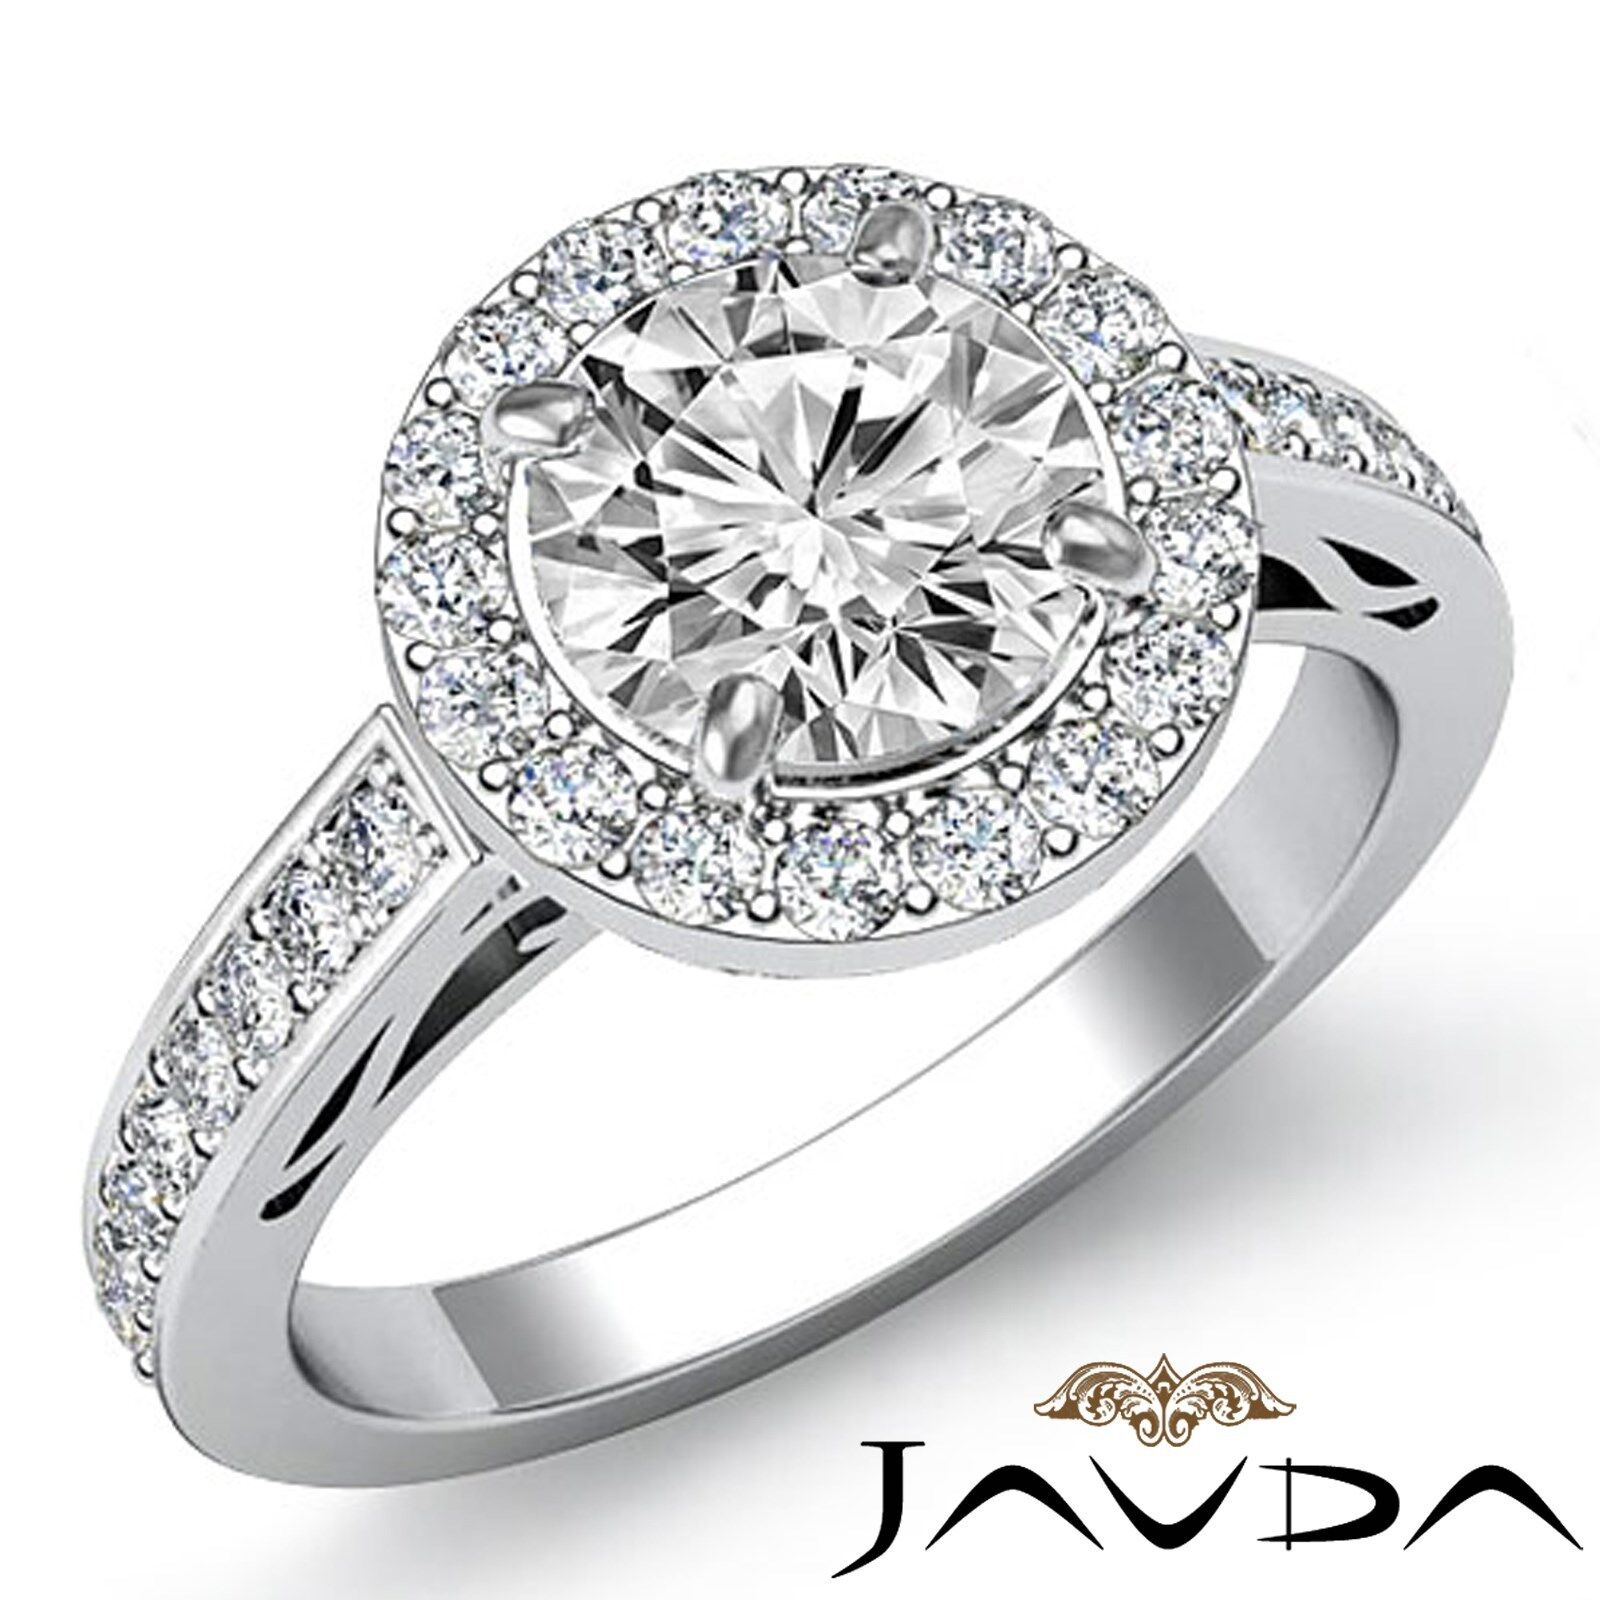 Halo Pave Setting Women's Round Diamond Engagement Filigree Ring GIA F VS1 2.8Ct